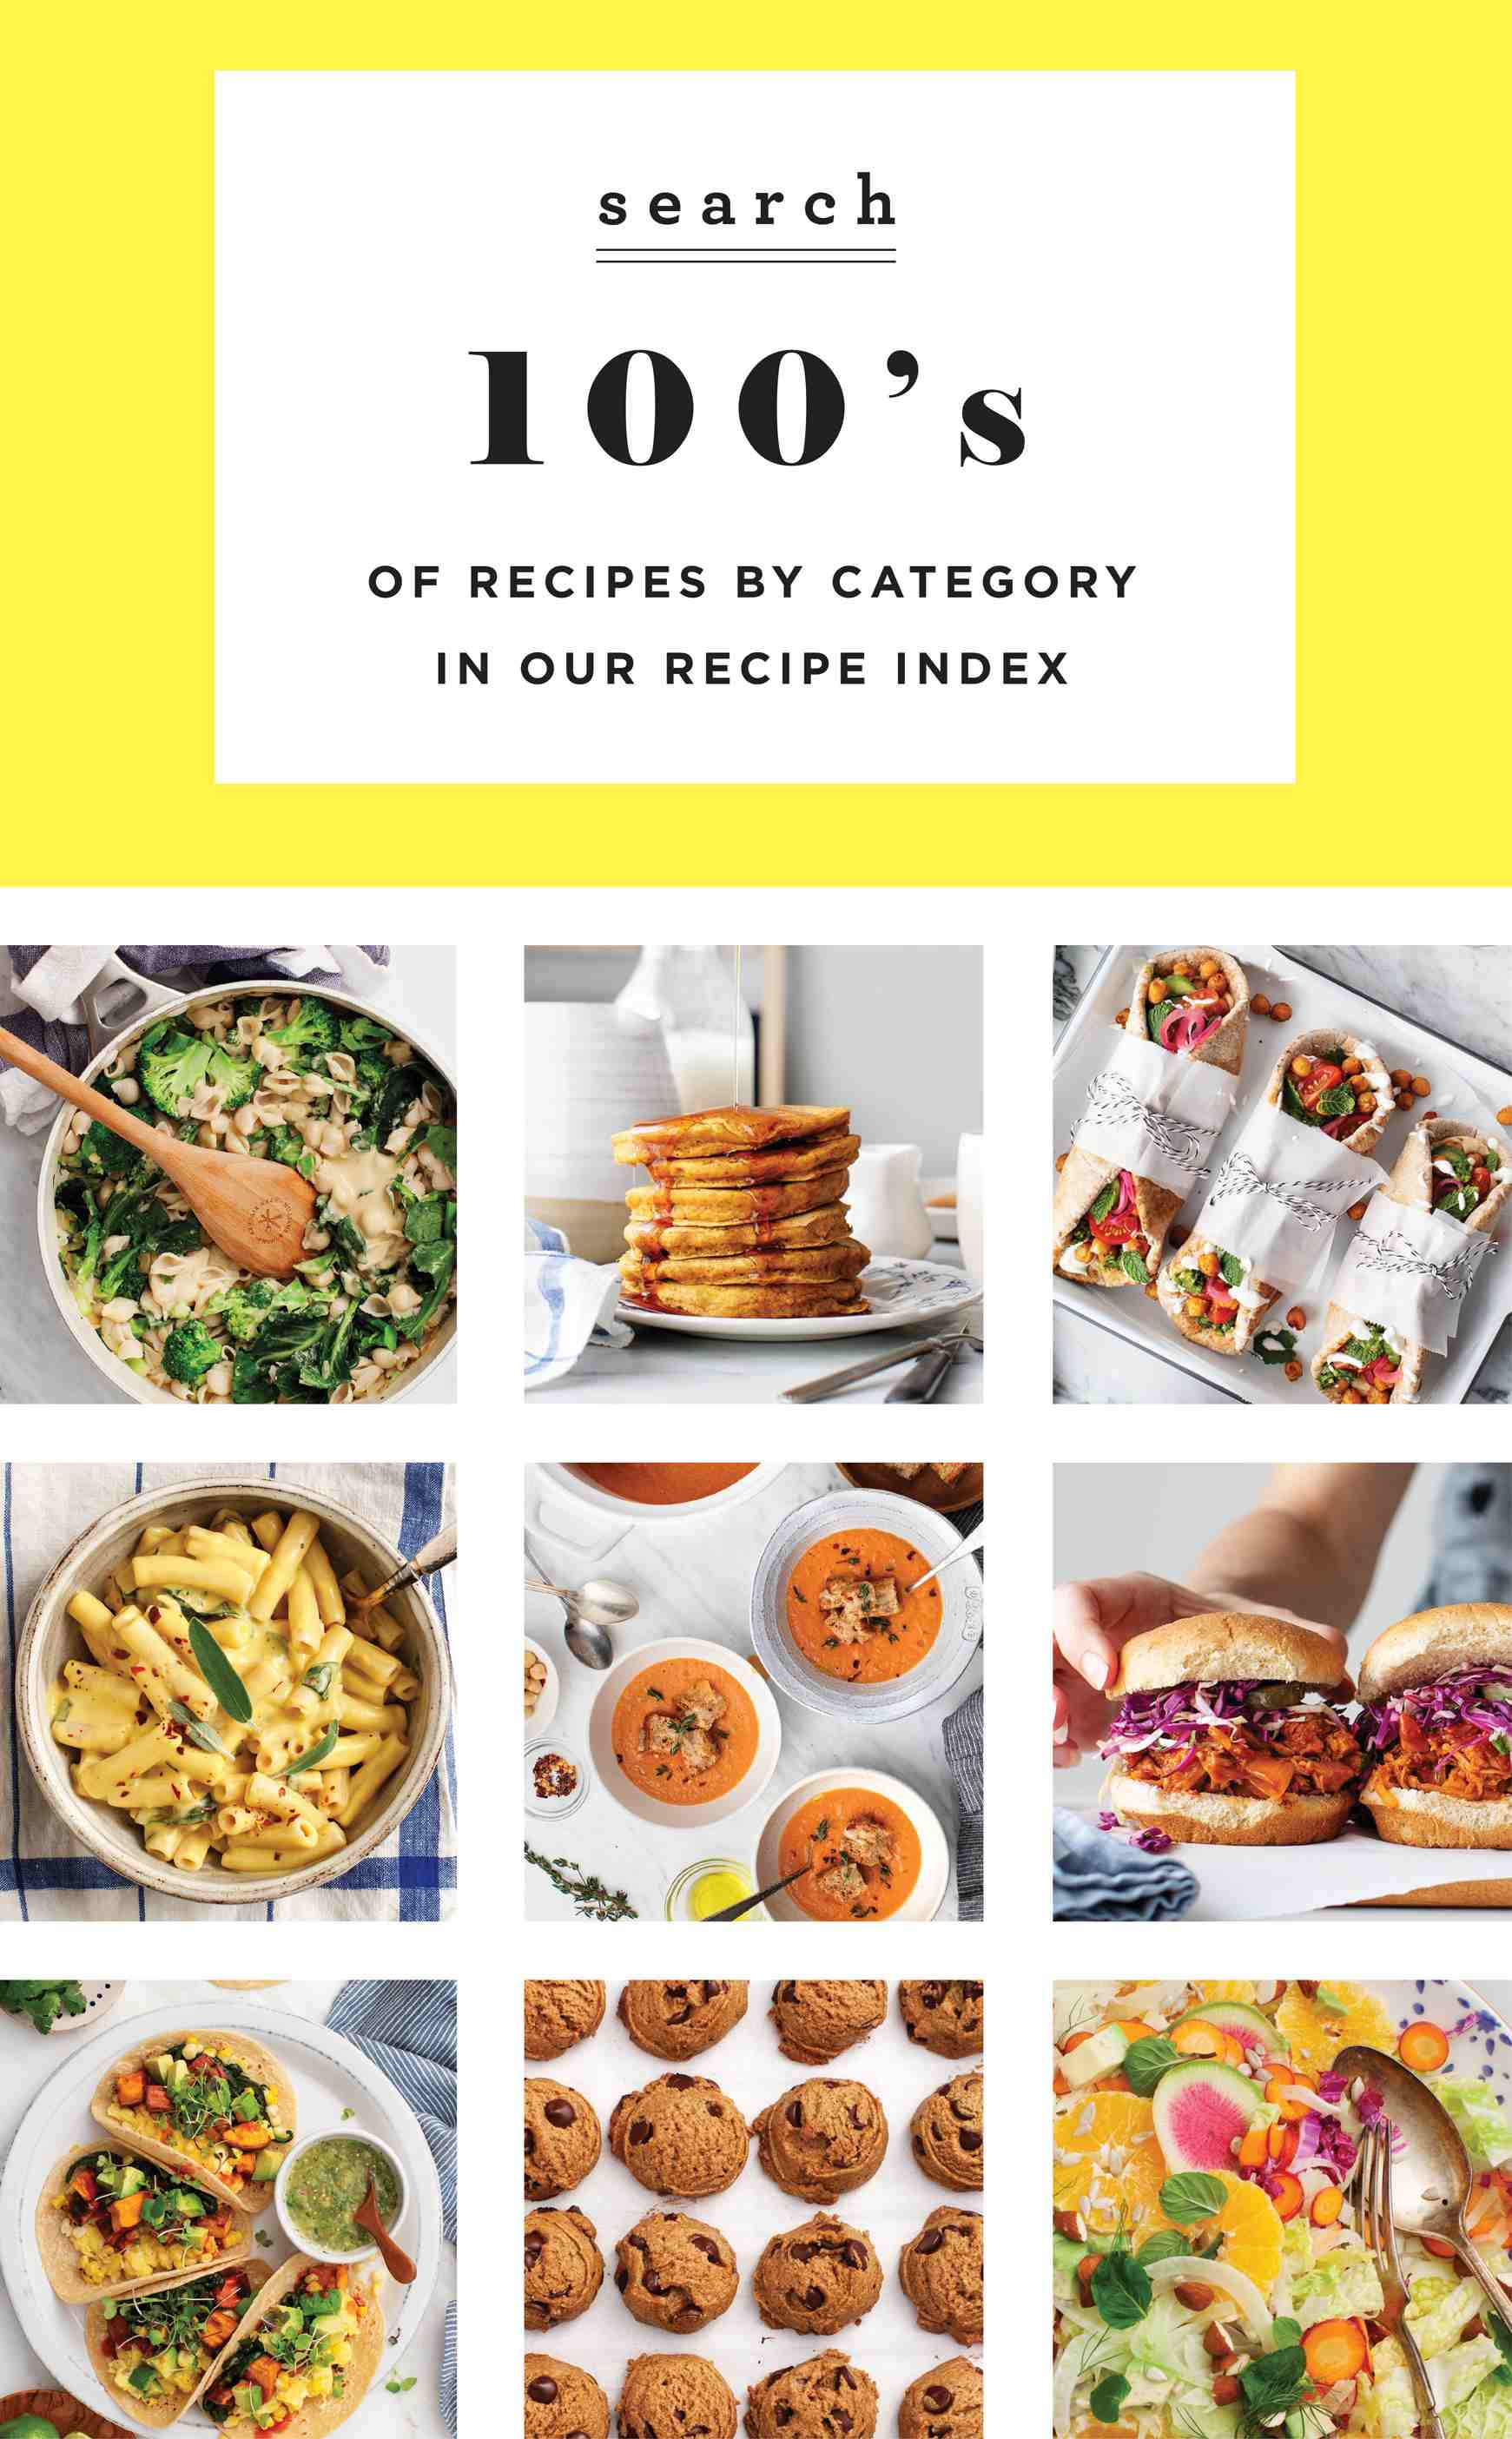 Love And Lemons Healthy Whole Food Vegan And Vegetarian Recipes